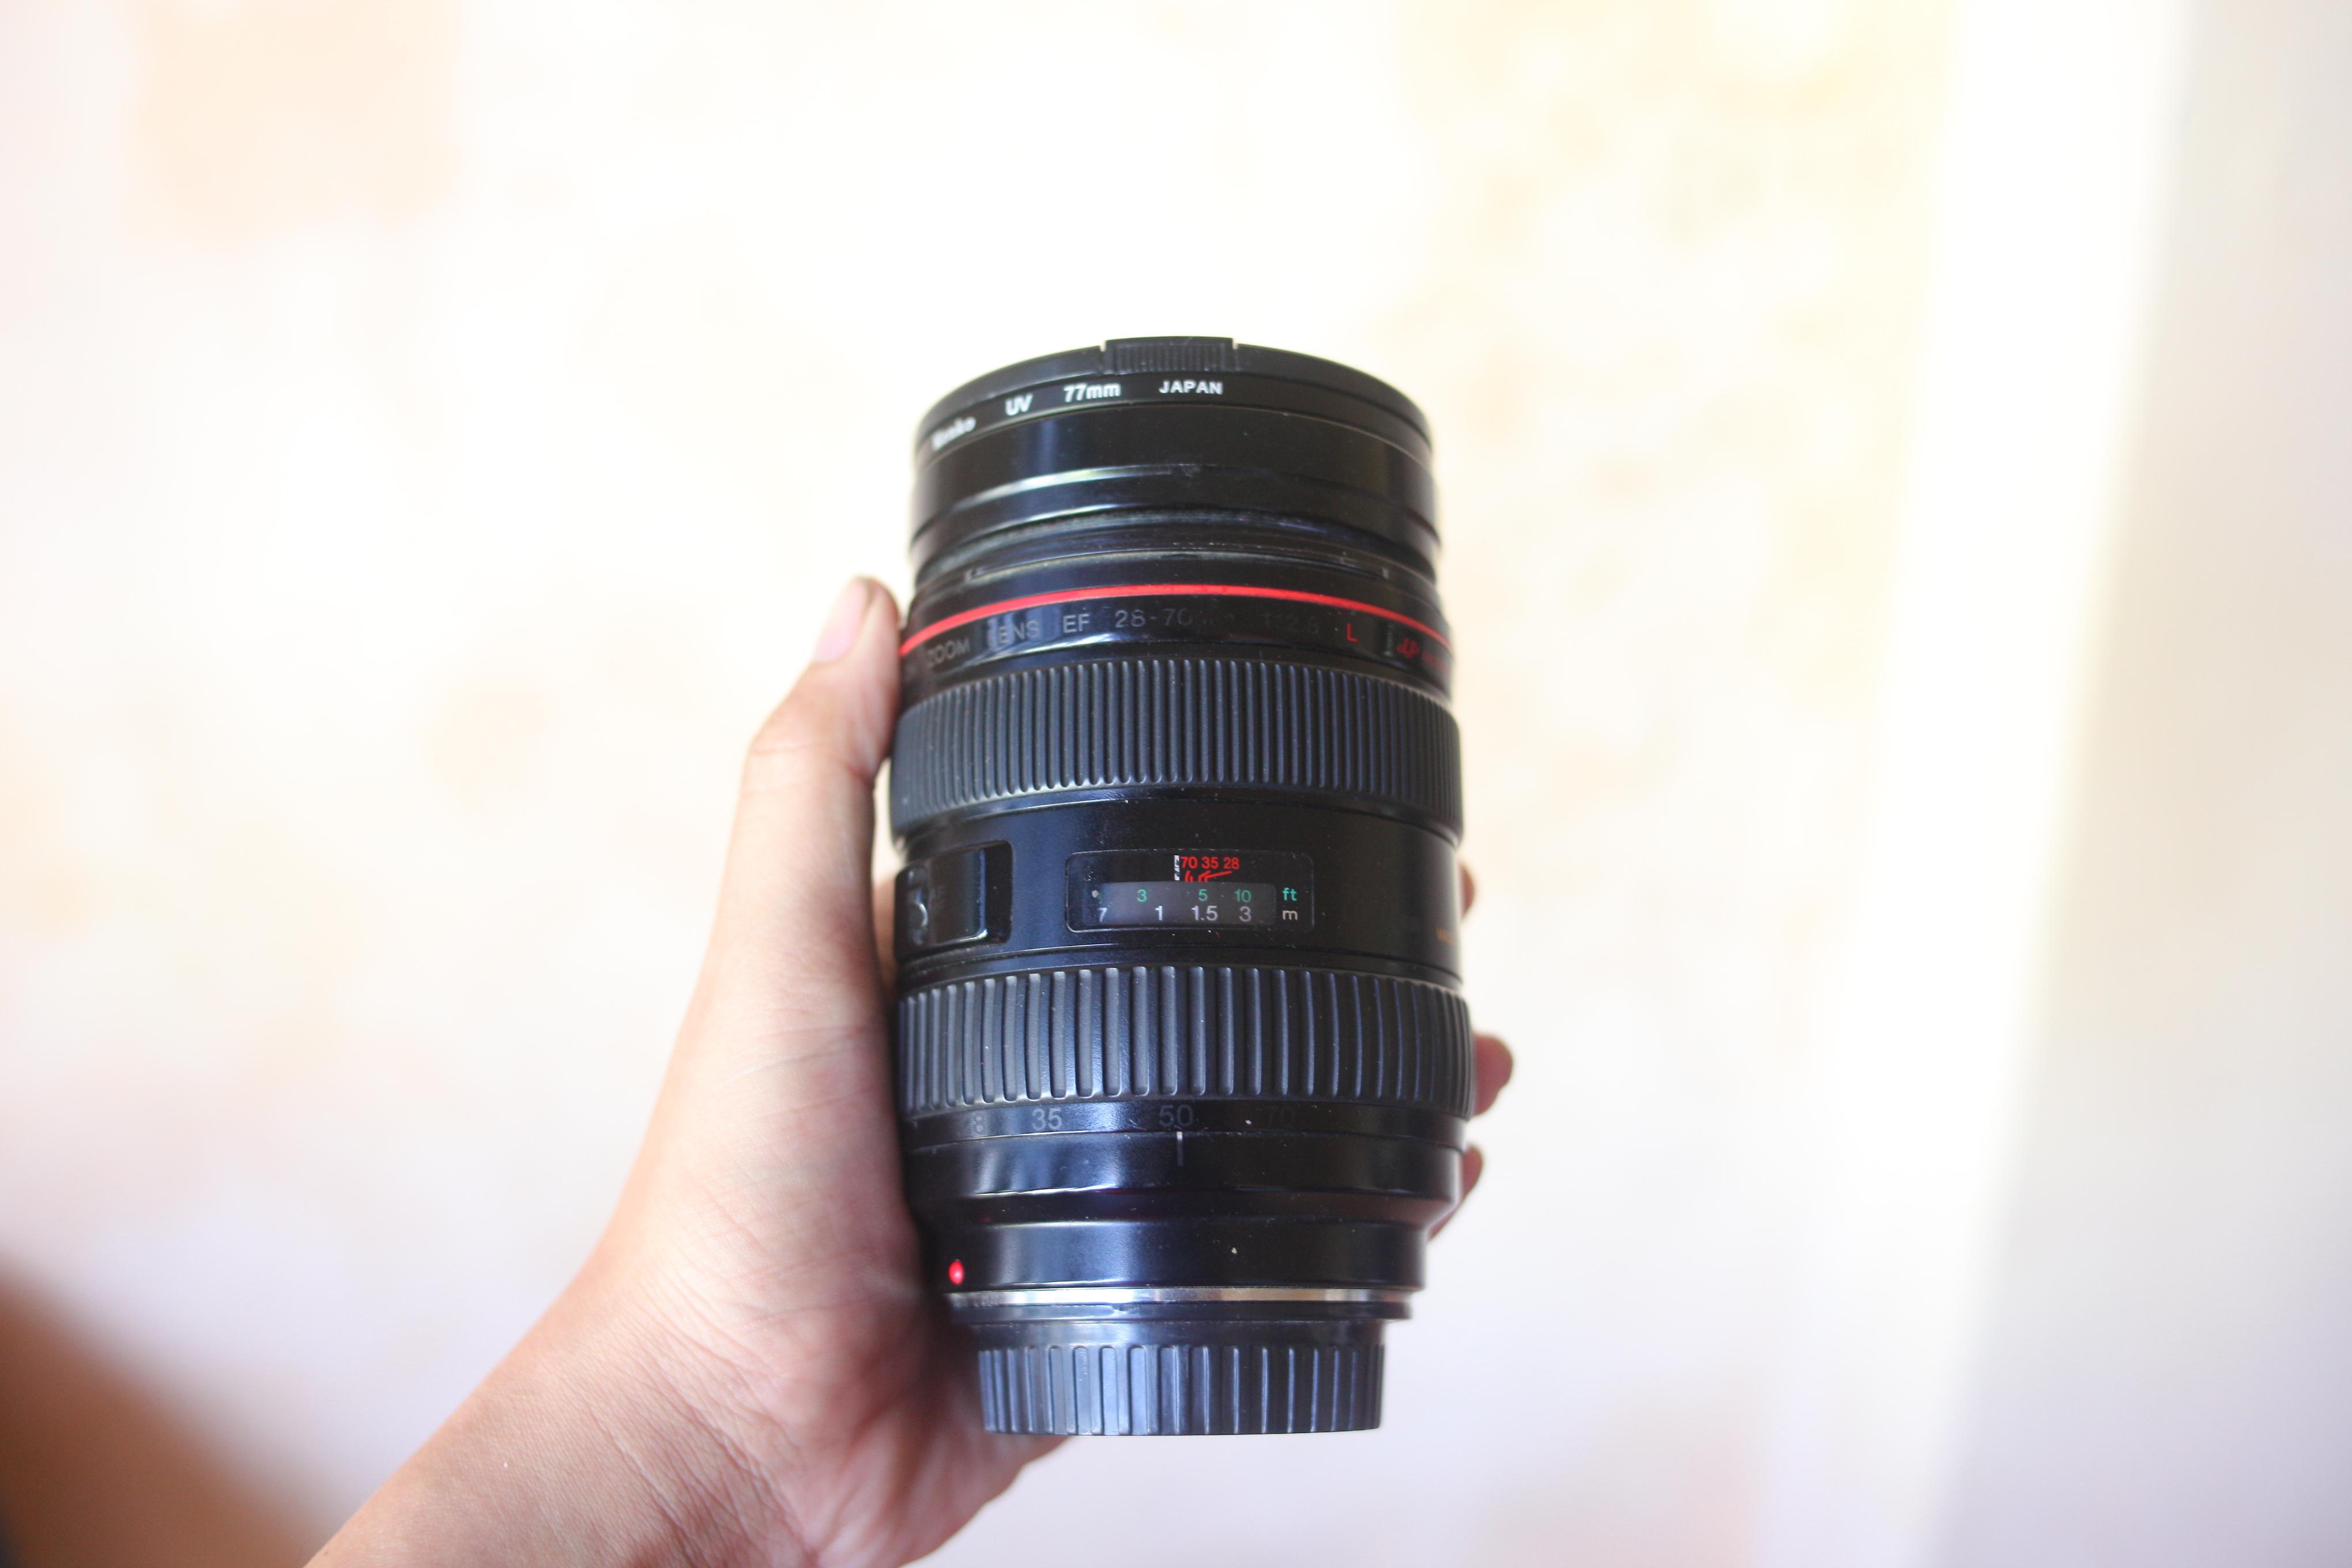 Cần bán lens Canon 28-70L f2.8 32627672434_dc05cbf02d_o